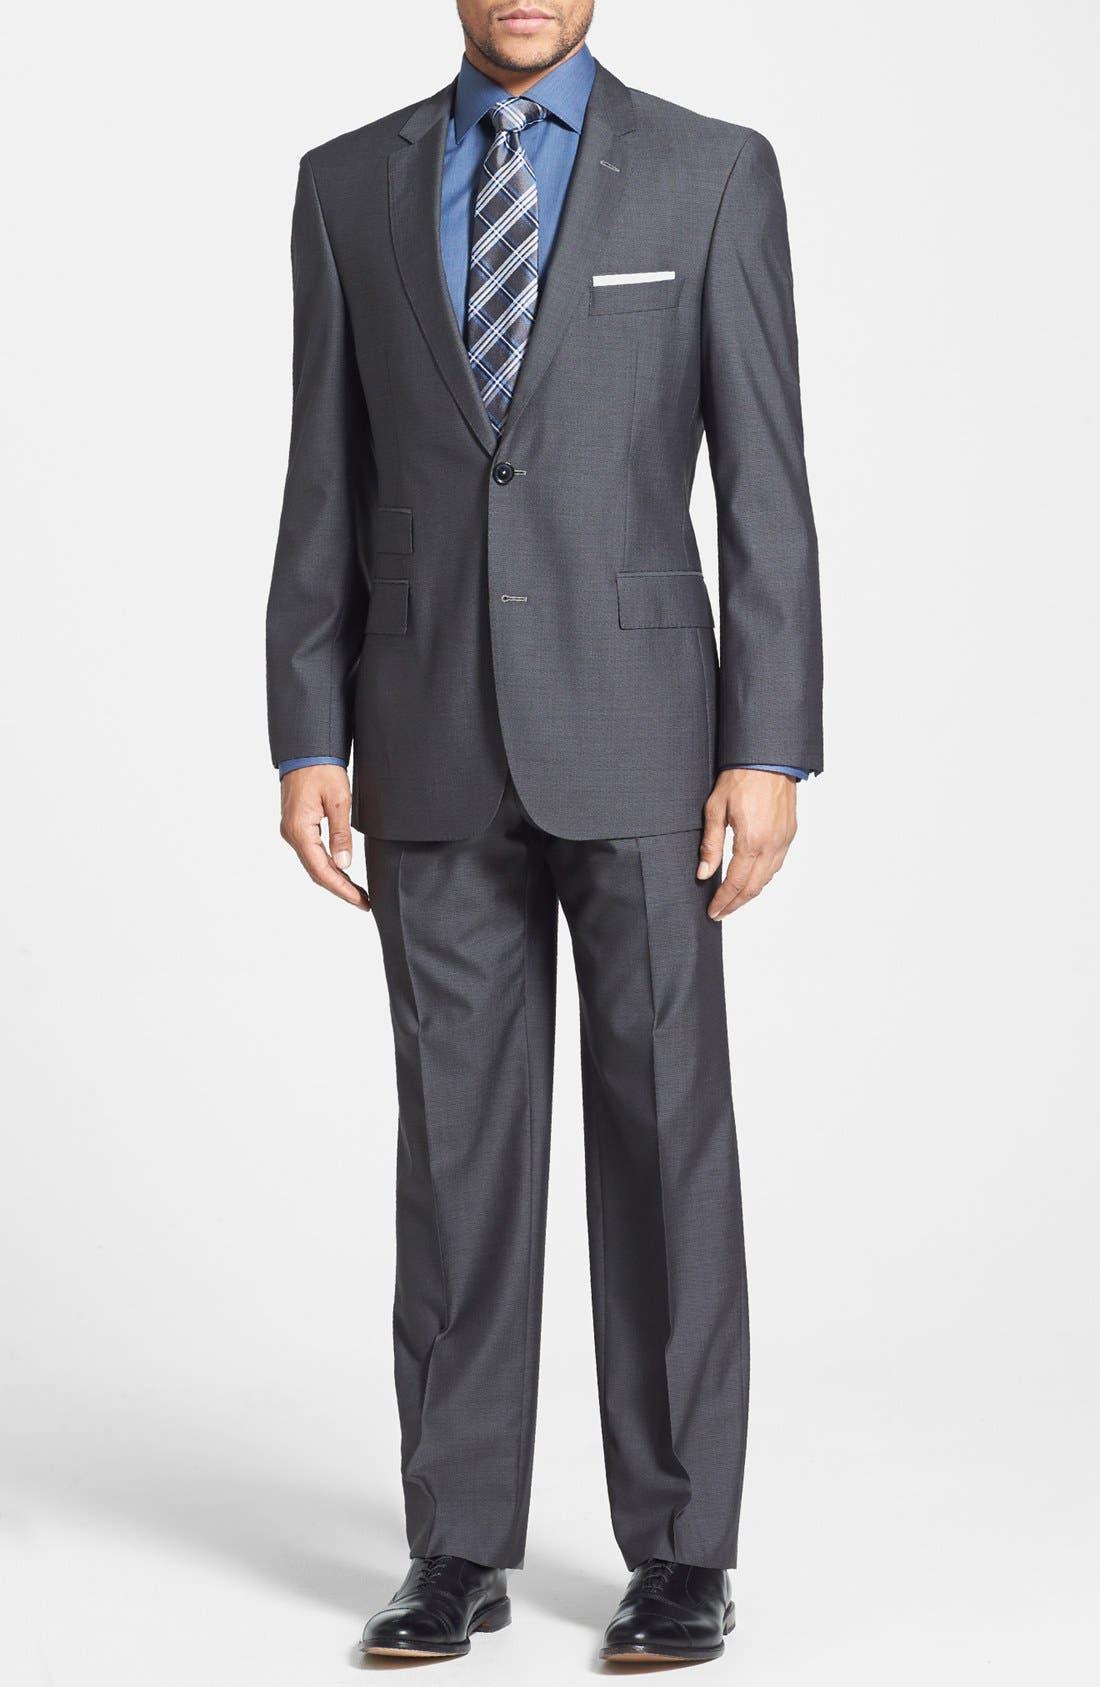 Alternate Image 1 Selected - BOSS HUGO BOSS 'Edison/Power' Classic Fit Wool Blend Suit